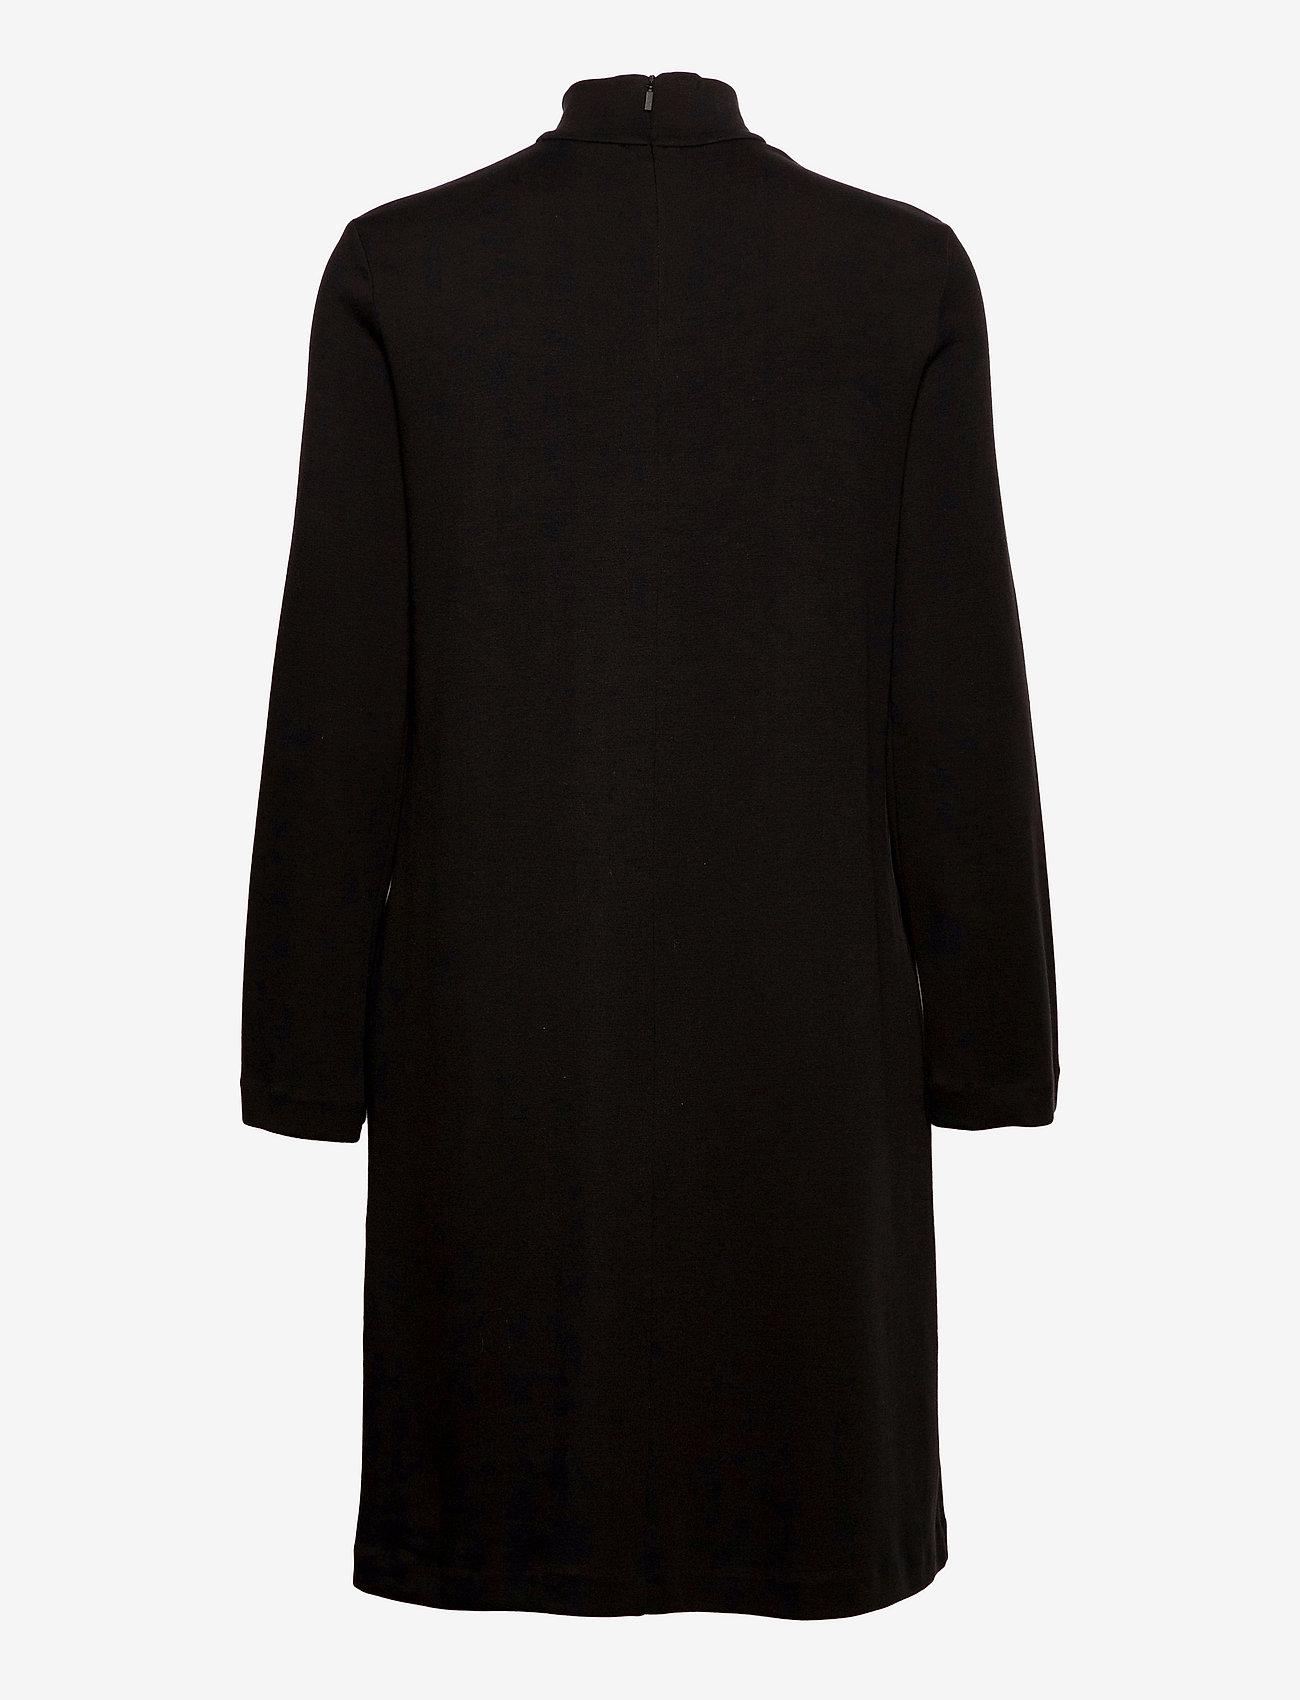 Max Mara Leisure - TRENTO - midi dresses - black - 1